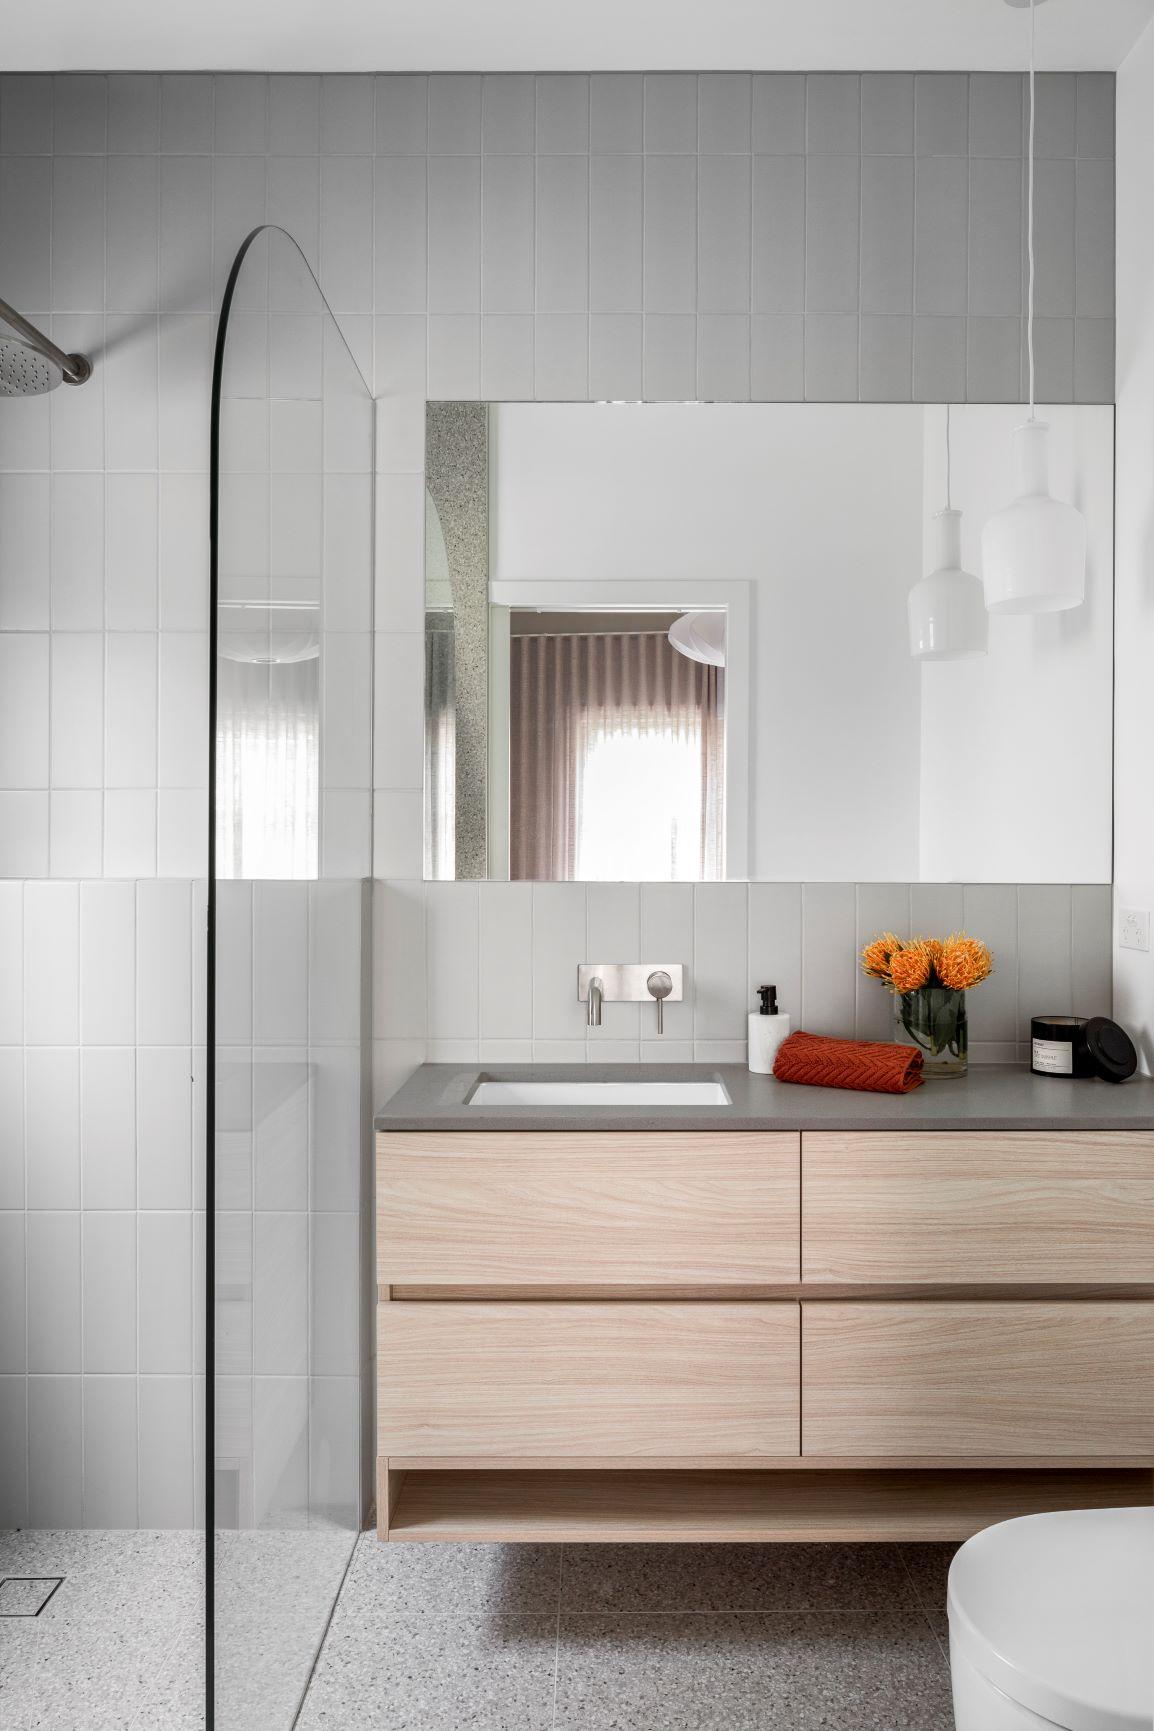 Robert Street Project - Modern House - Bathroom Vanity